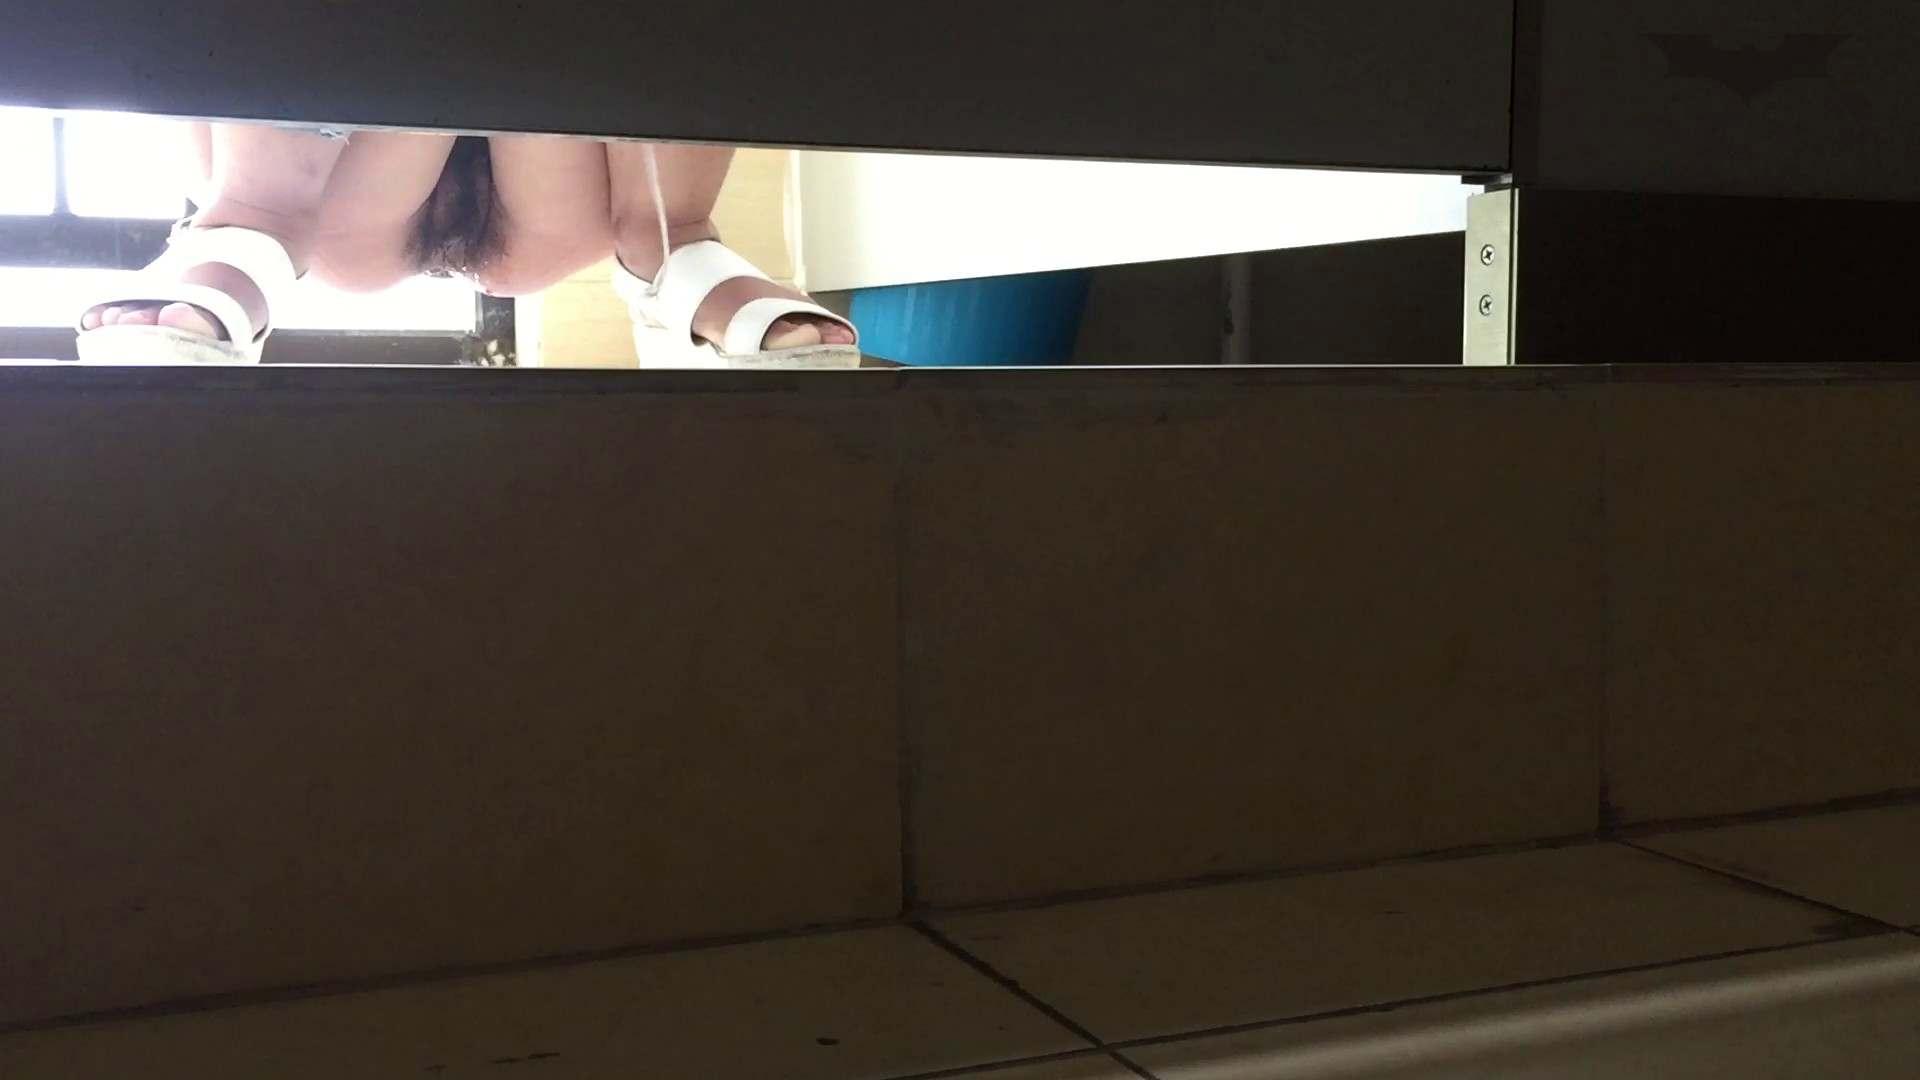 JD盗撮 美女の洗面所の秘密 Vol.66 洗面所のぞき AV無料動画キャプチャ 110枚 82